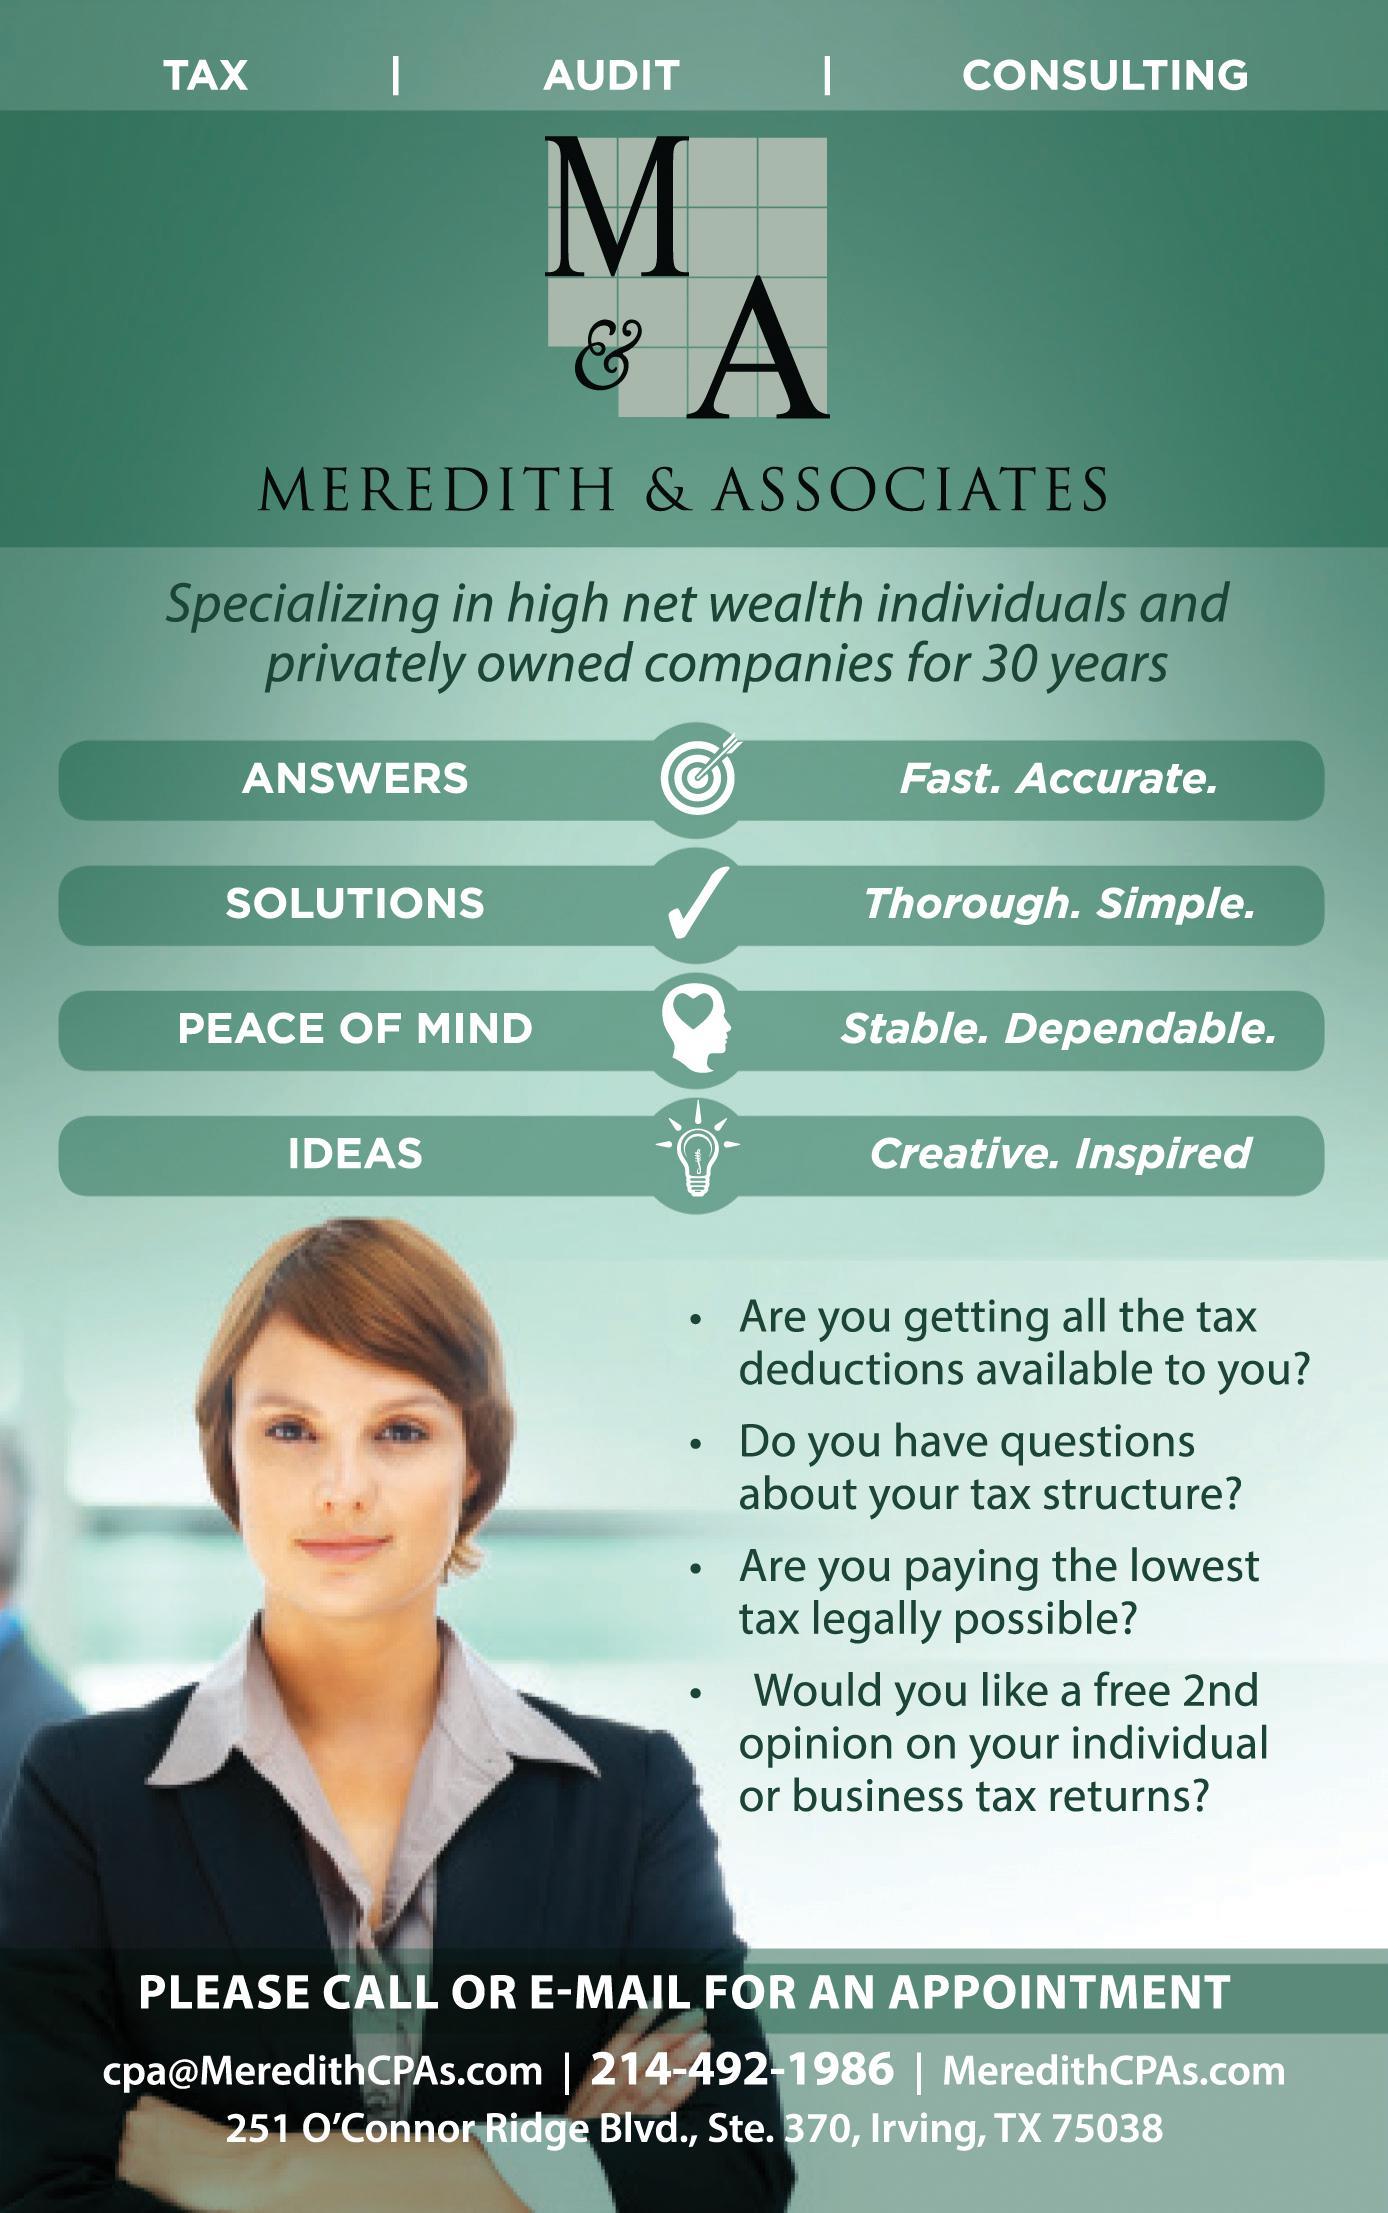 Meredith & Associates, CPAs